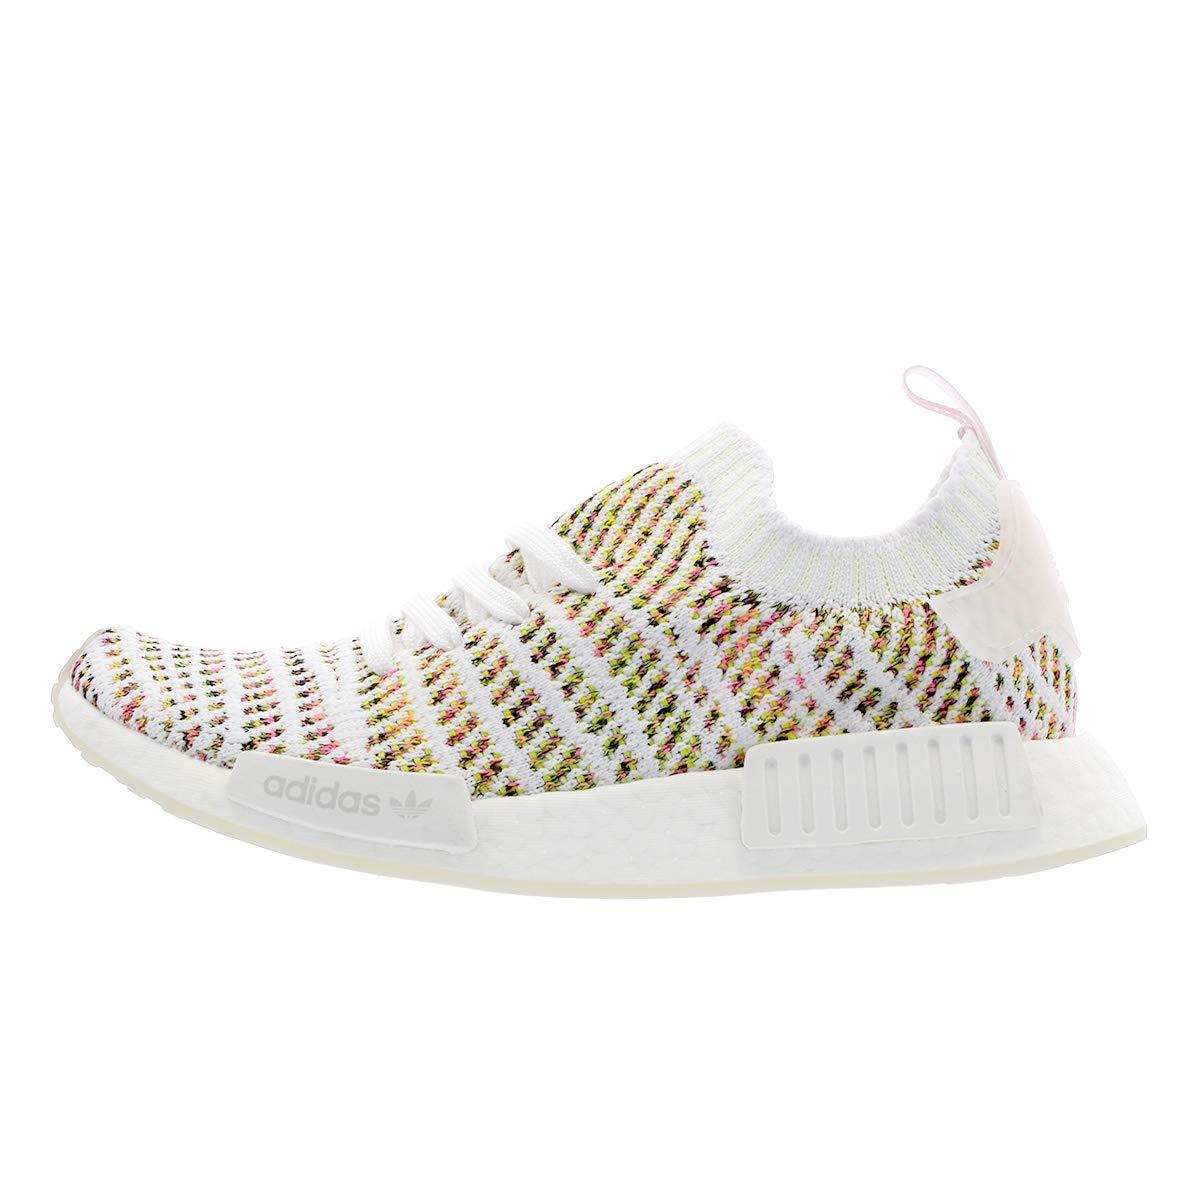 separation shoes 4af51 1afa4 adidas Originals NMD_R1 STLT Primeknit Shoe - Women's Casual